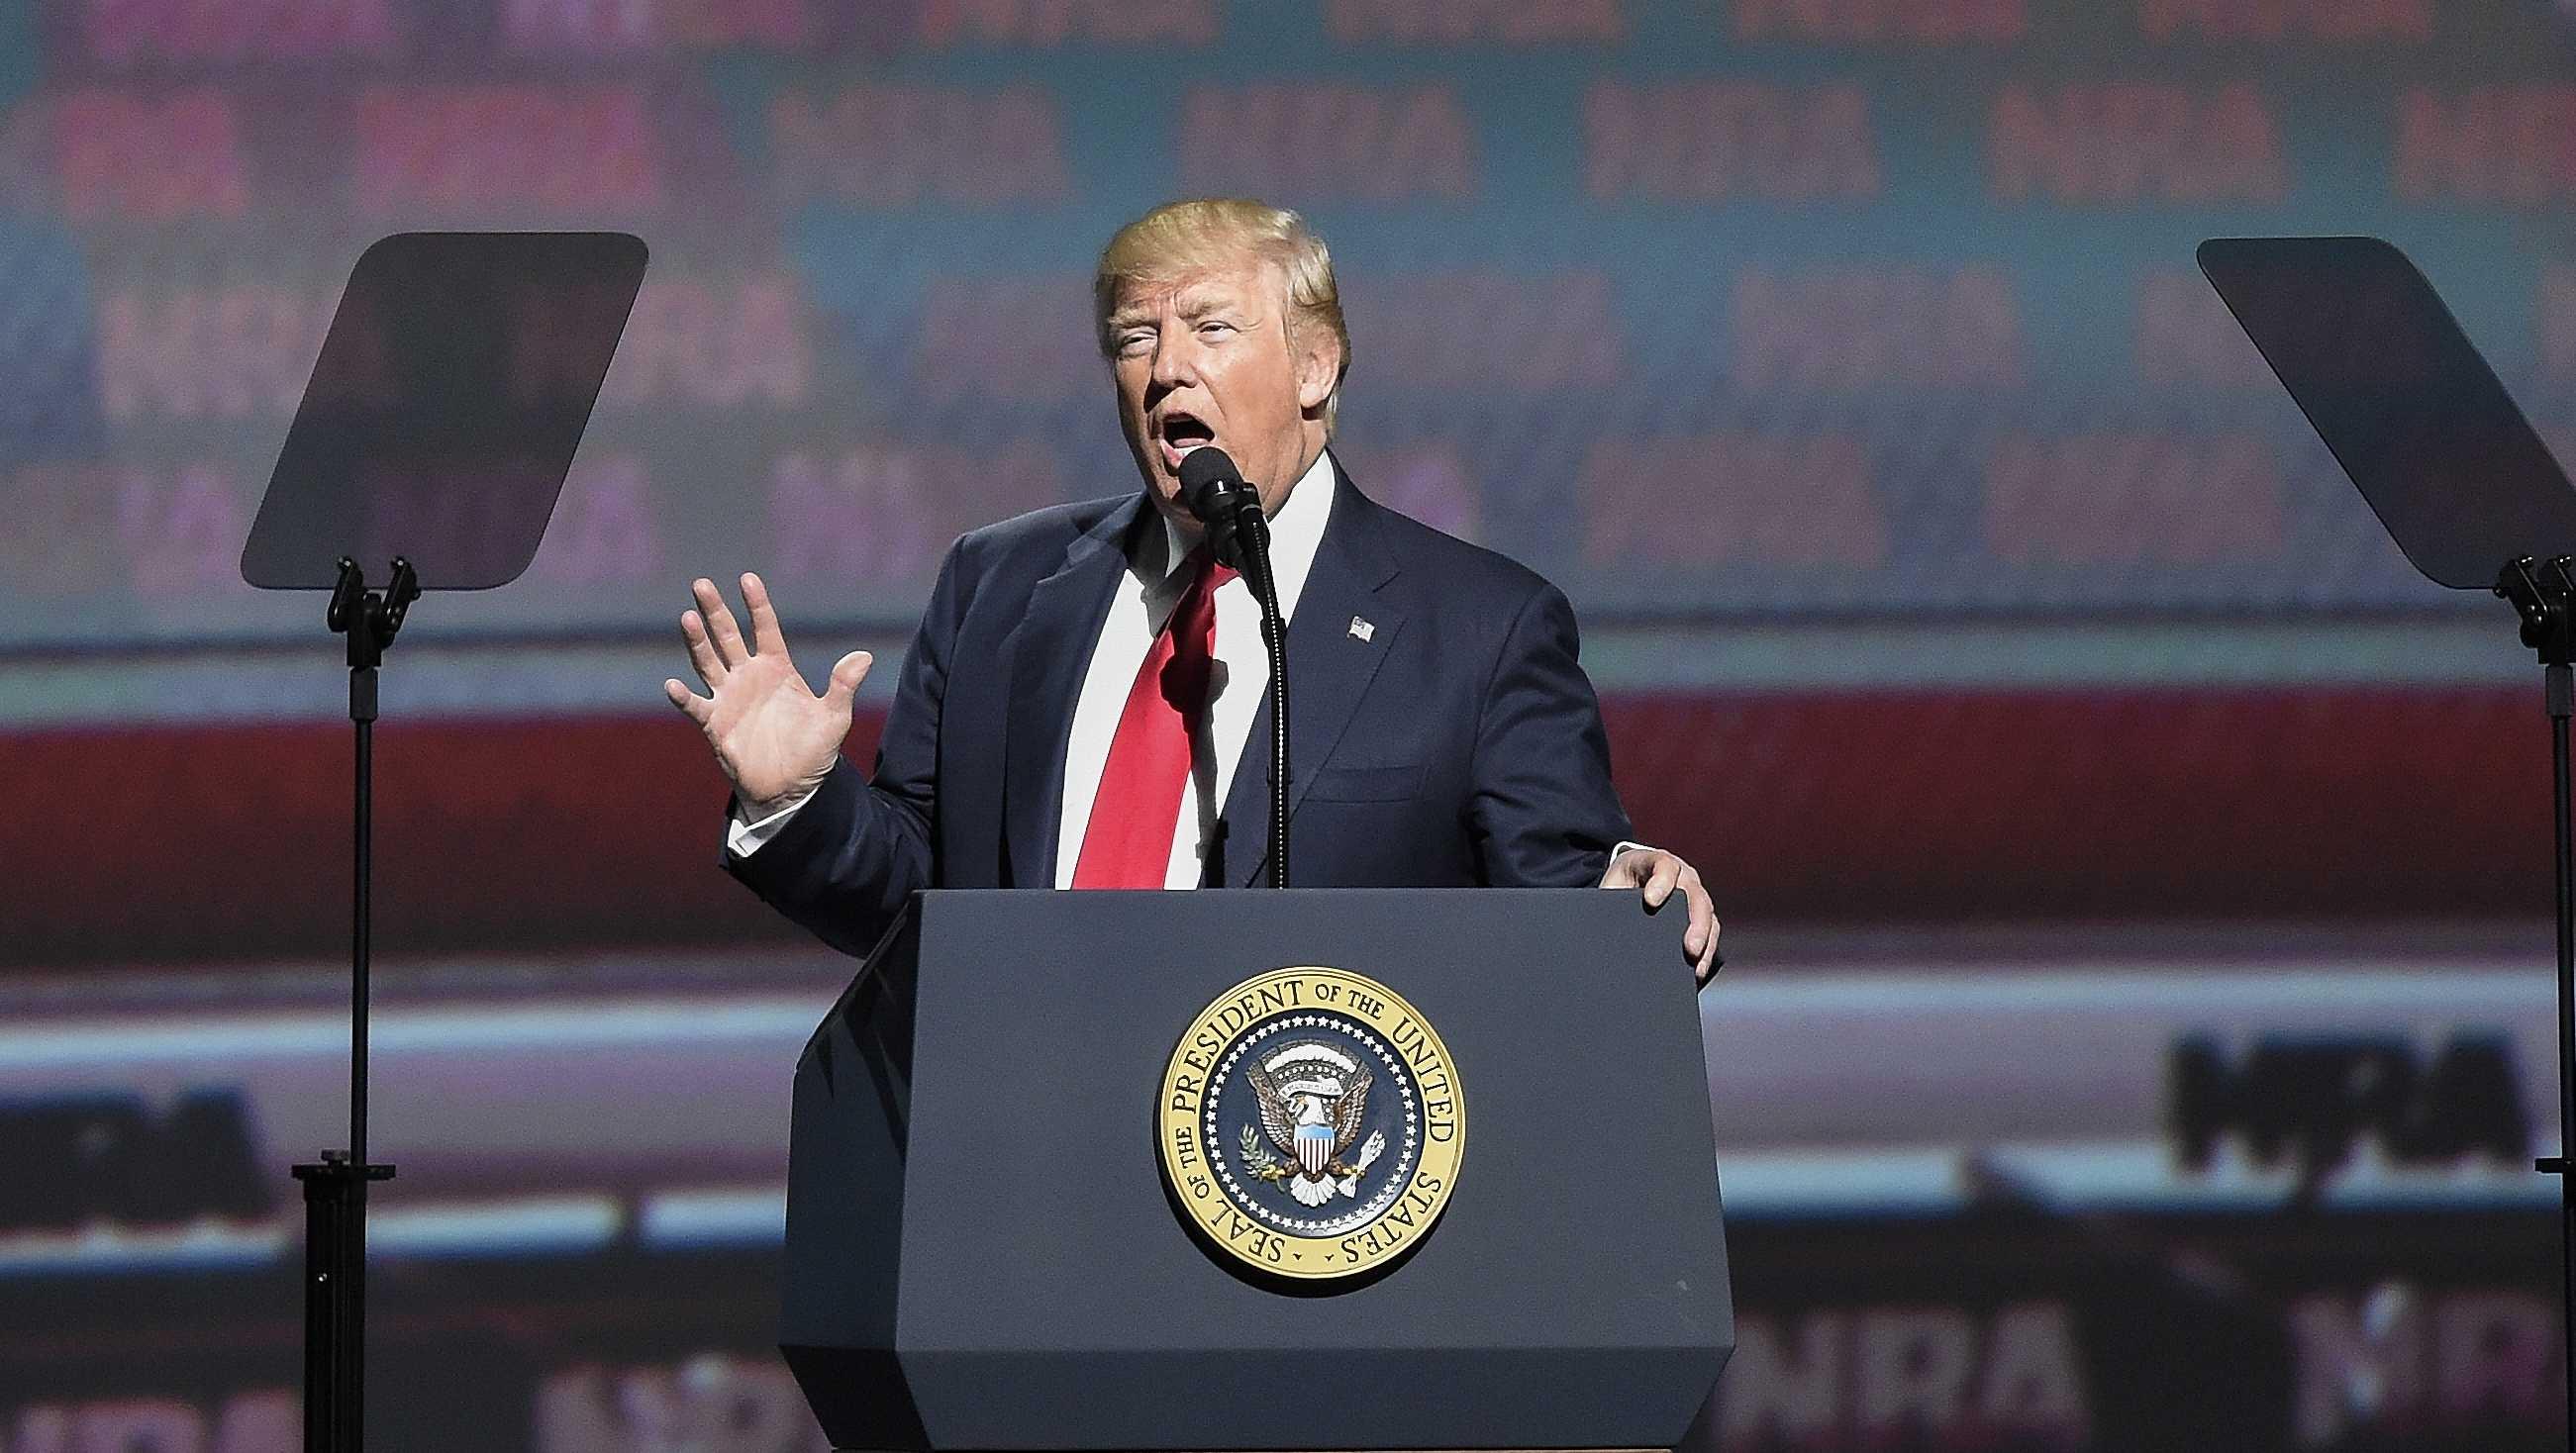 President Donald Trump speaks during the National Rifle Association-ILA Leadership Forum, Friday, April 28, 2017, in Atlanta.